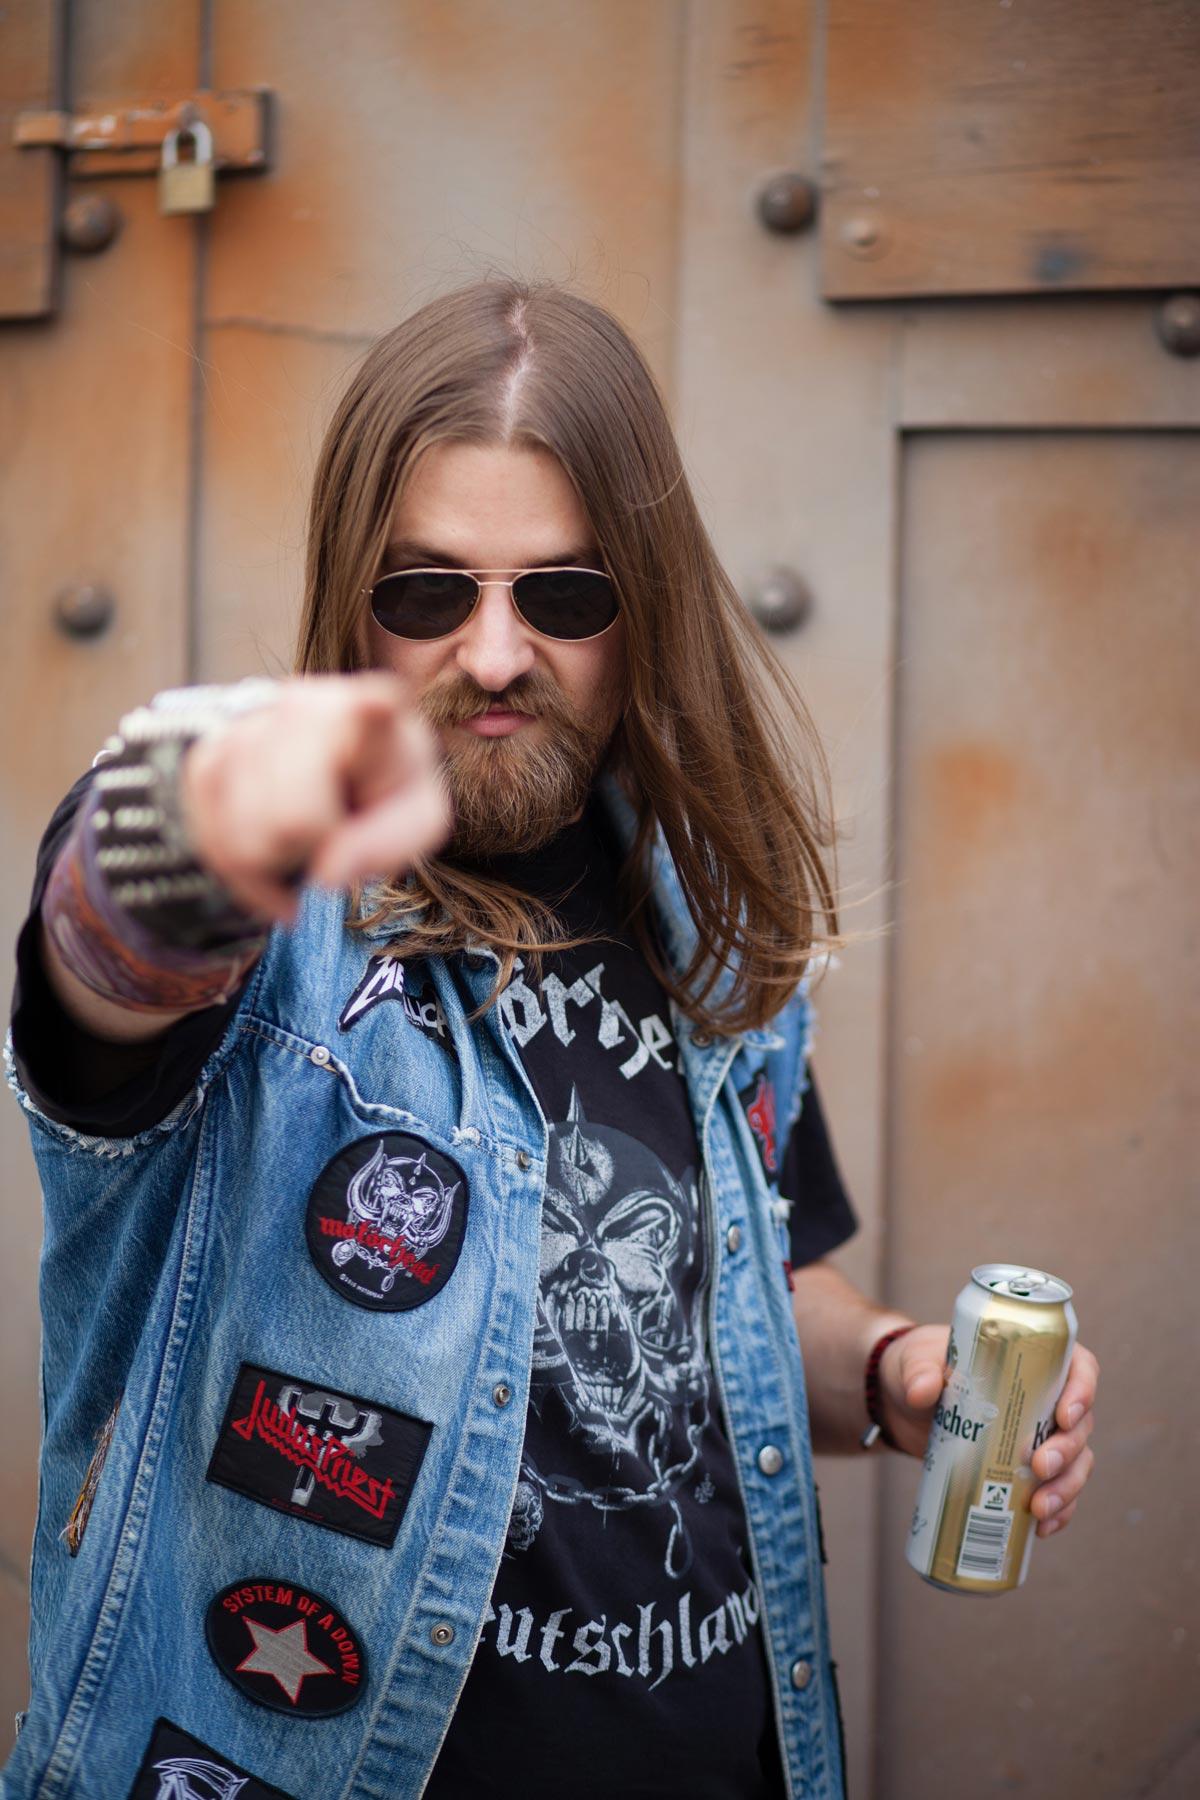 Boba Cat - Rock N' Roll